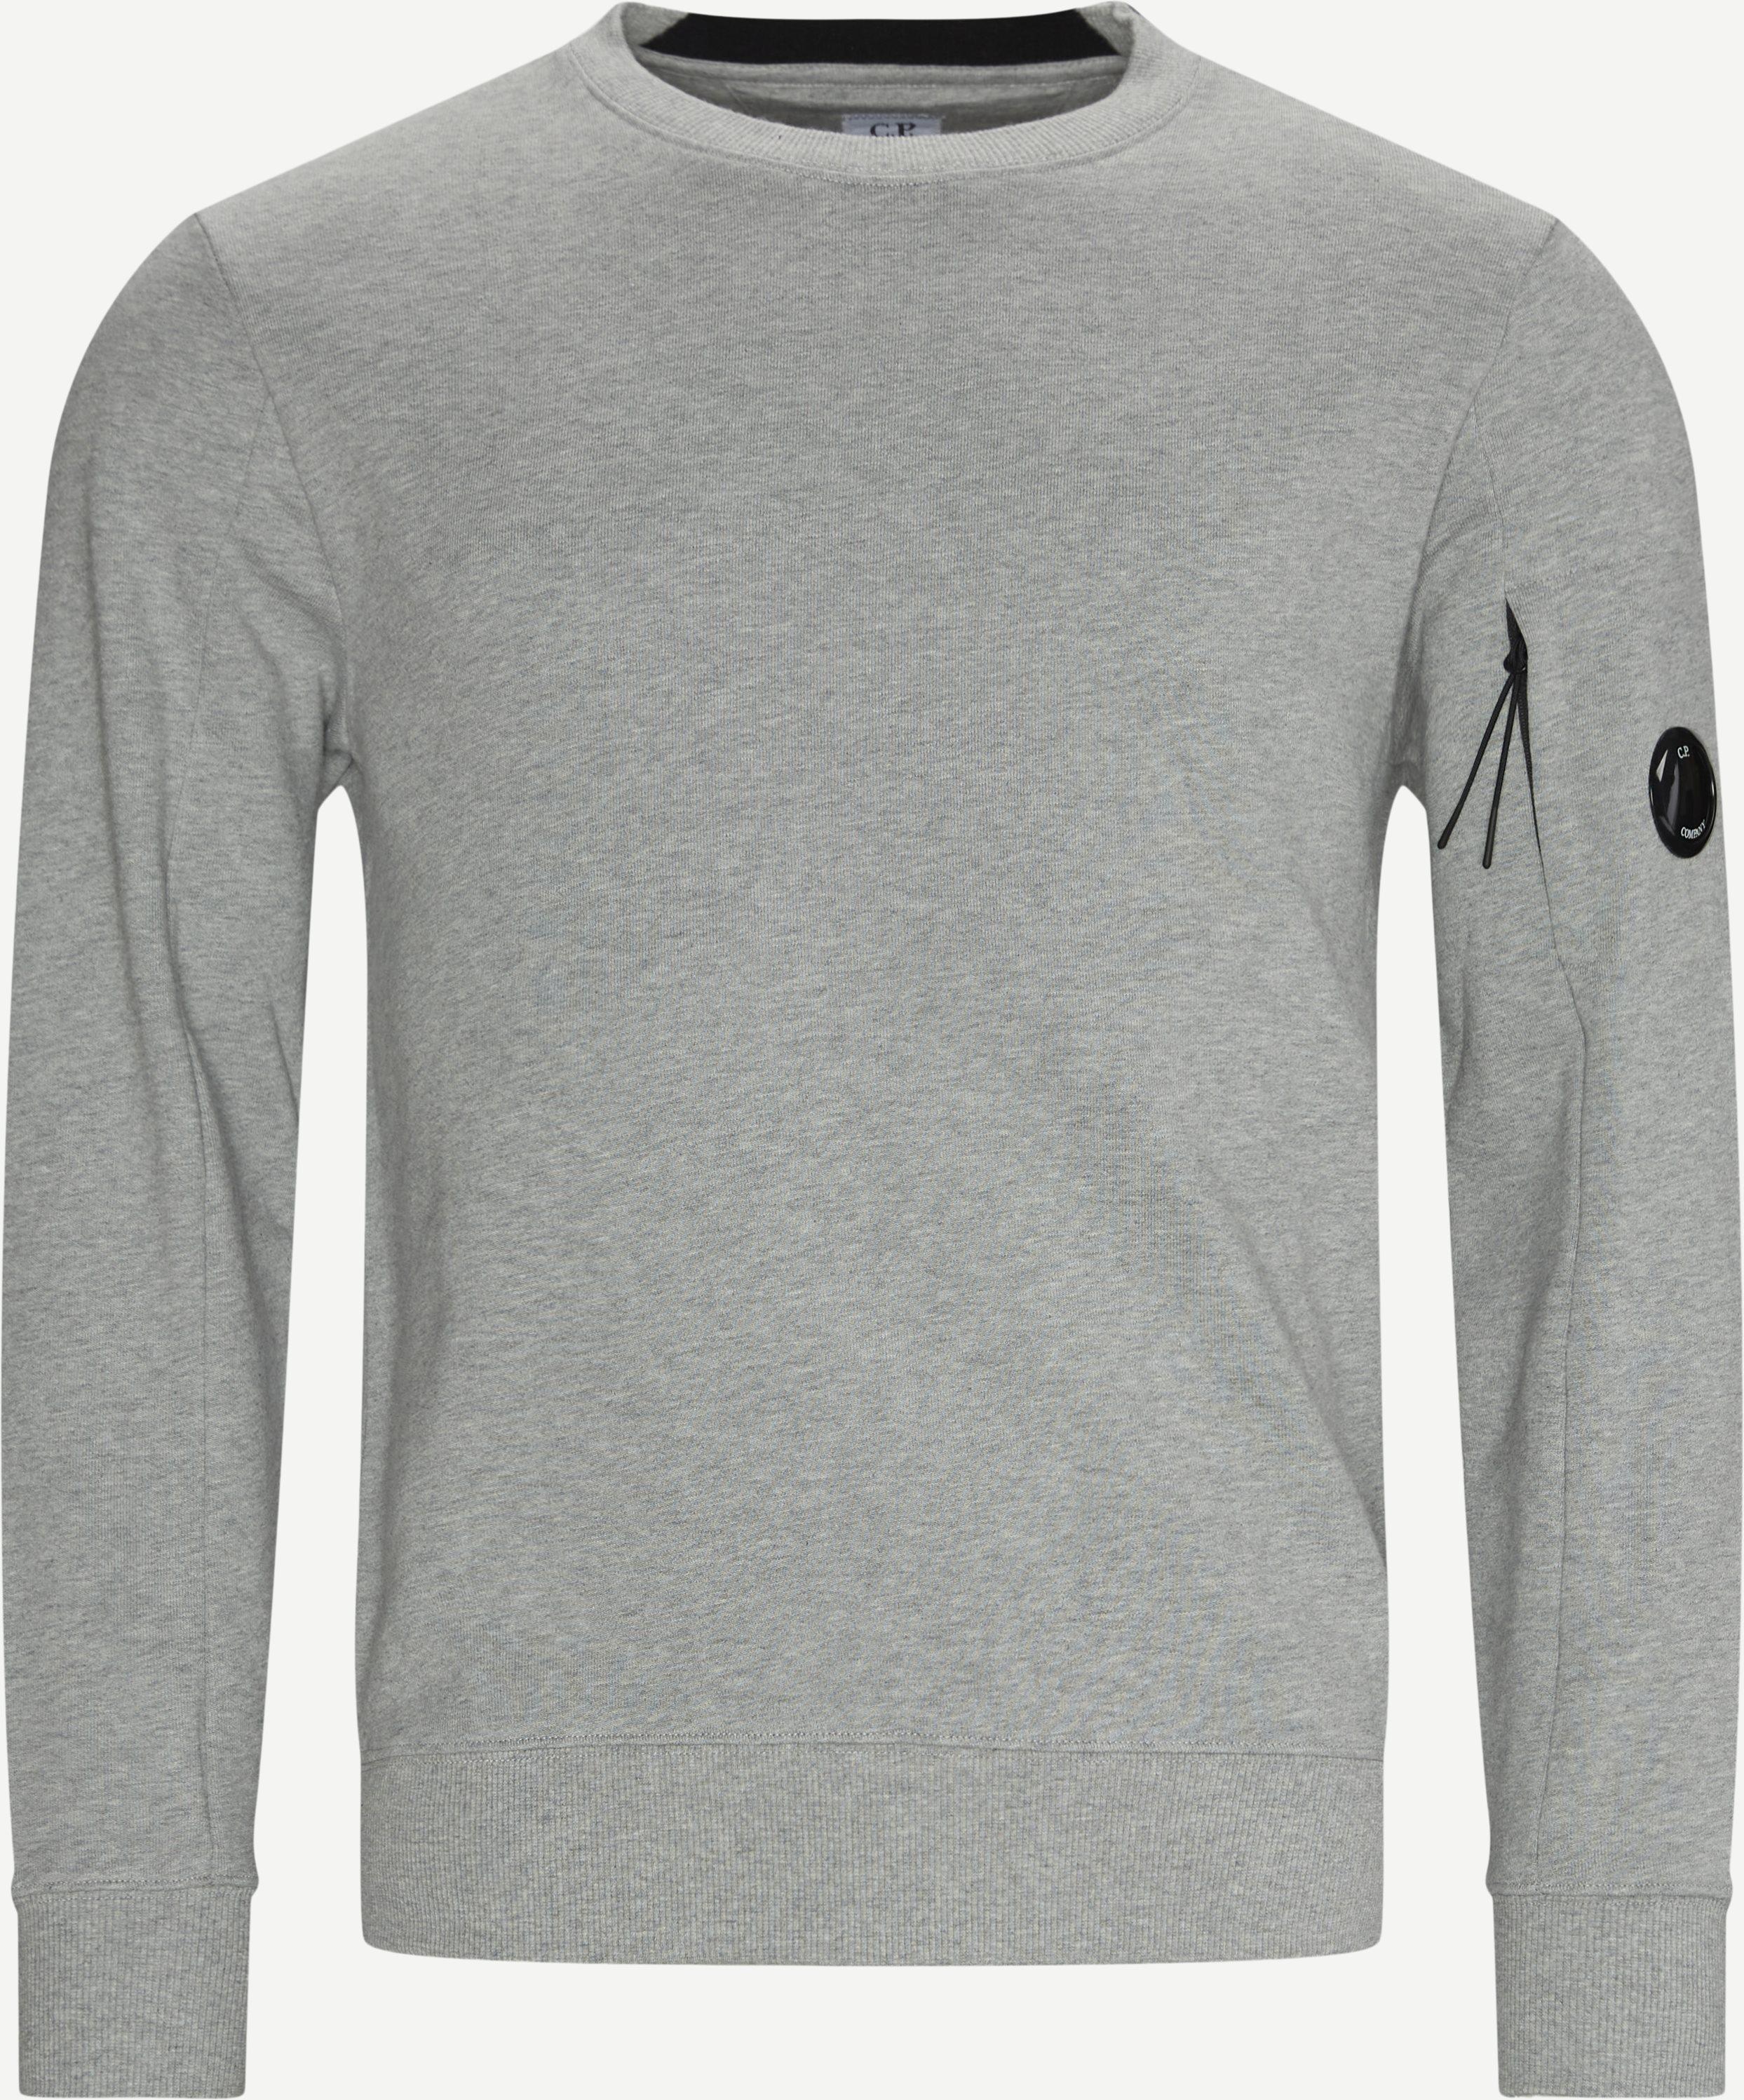 Garment Dyed Light Fleece Lens Crew Sweat - Sweatshirts - Regular - Grey